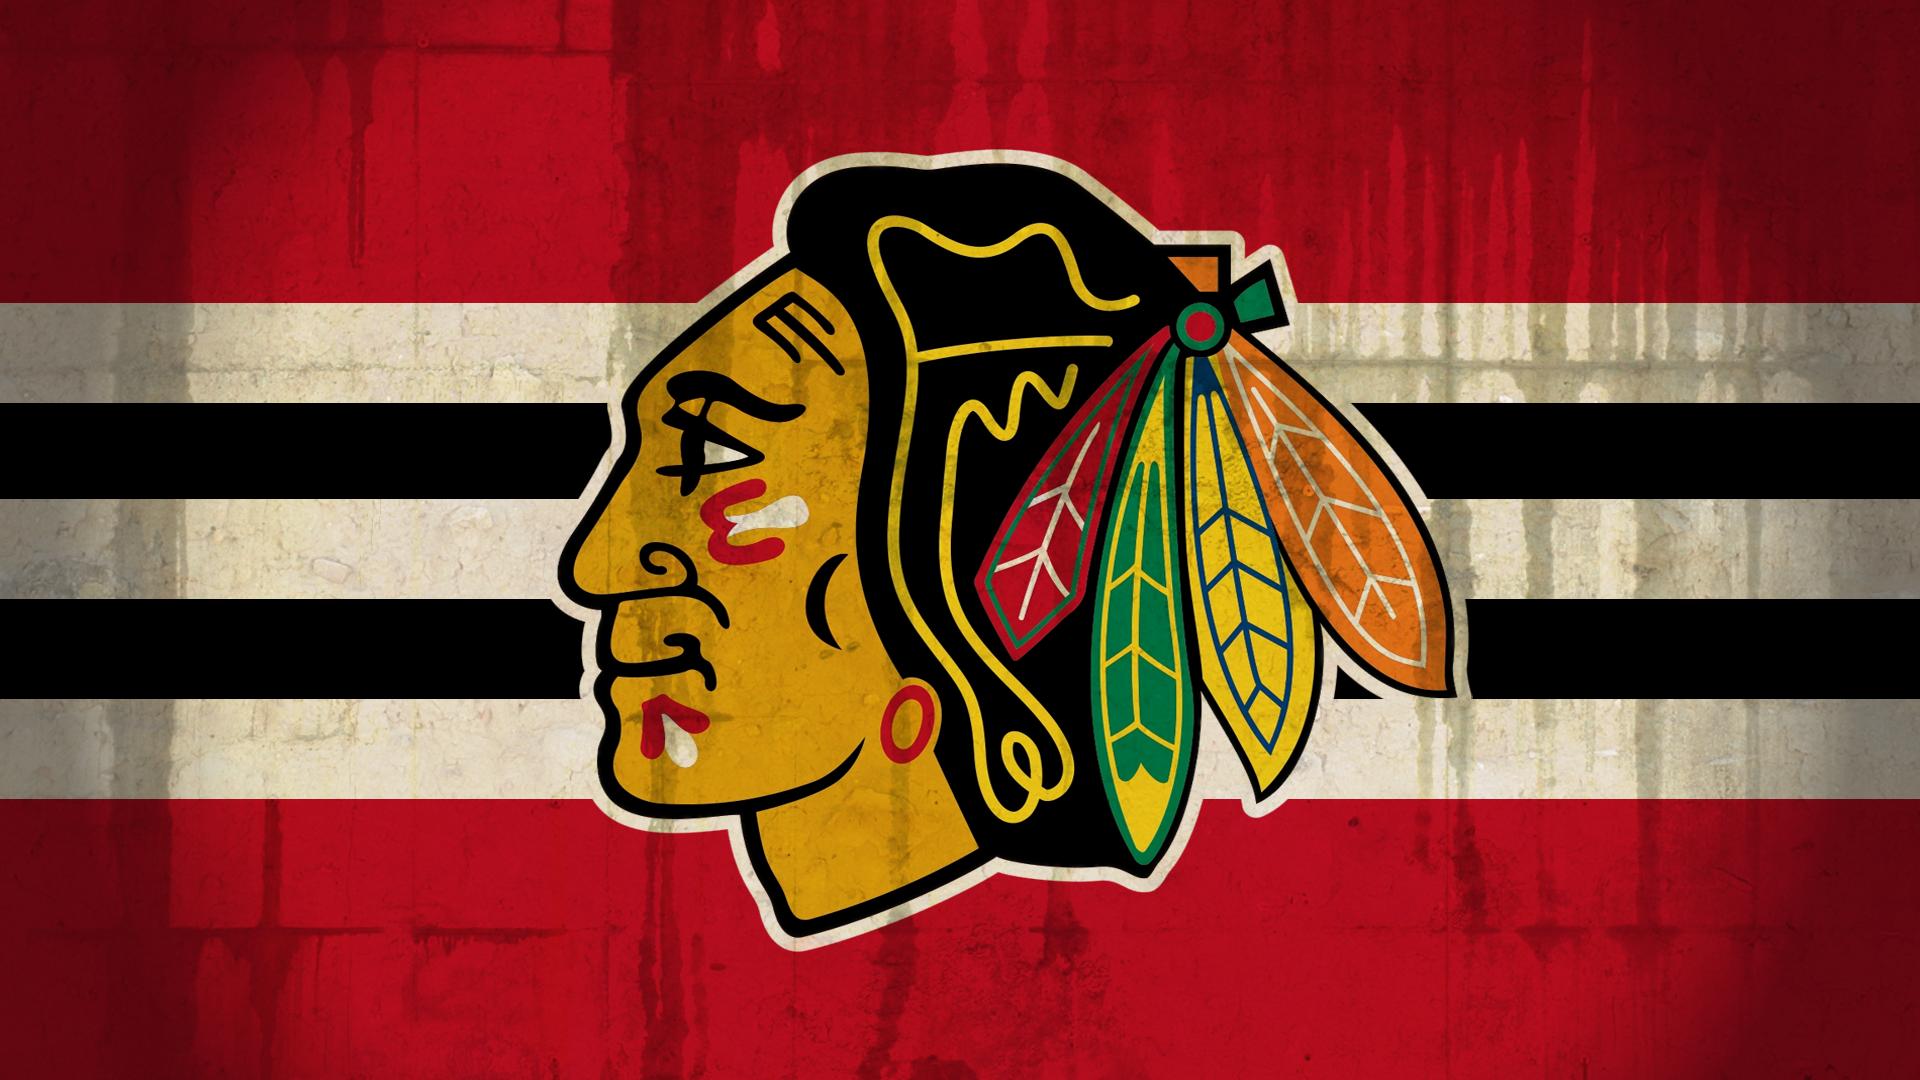 Greatness Chicago Blackhawks Wallpaper Chicago Blackhawks Logo Nhl Blackhawks